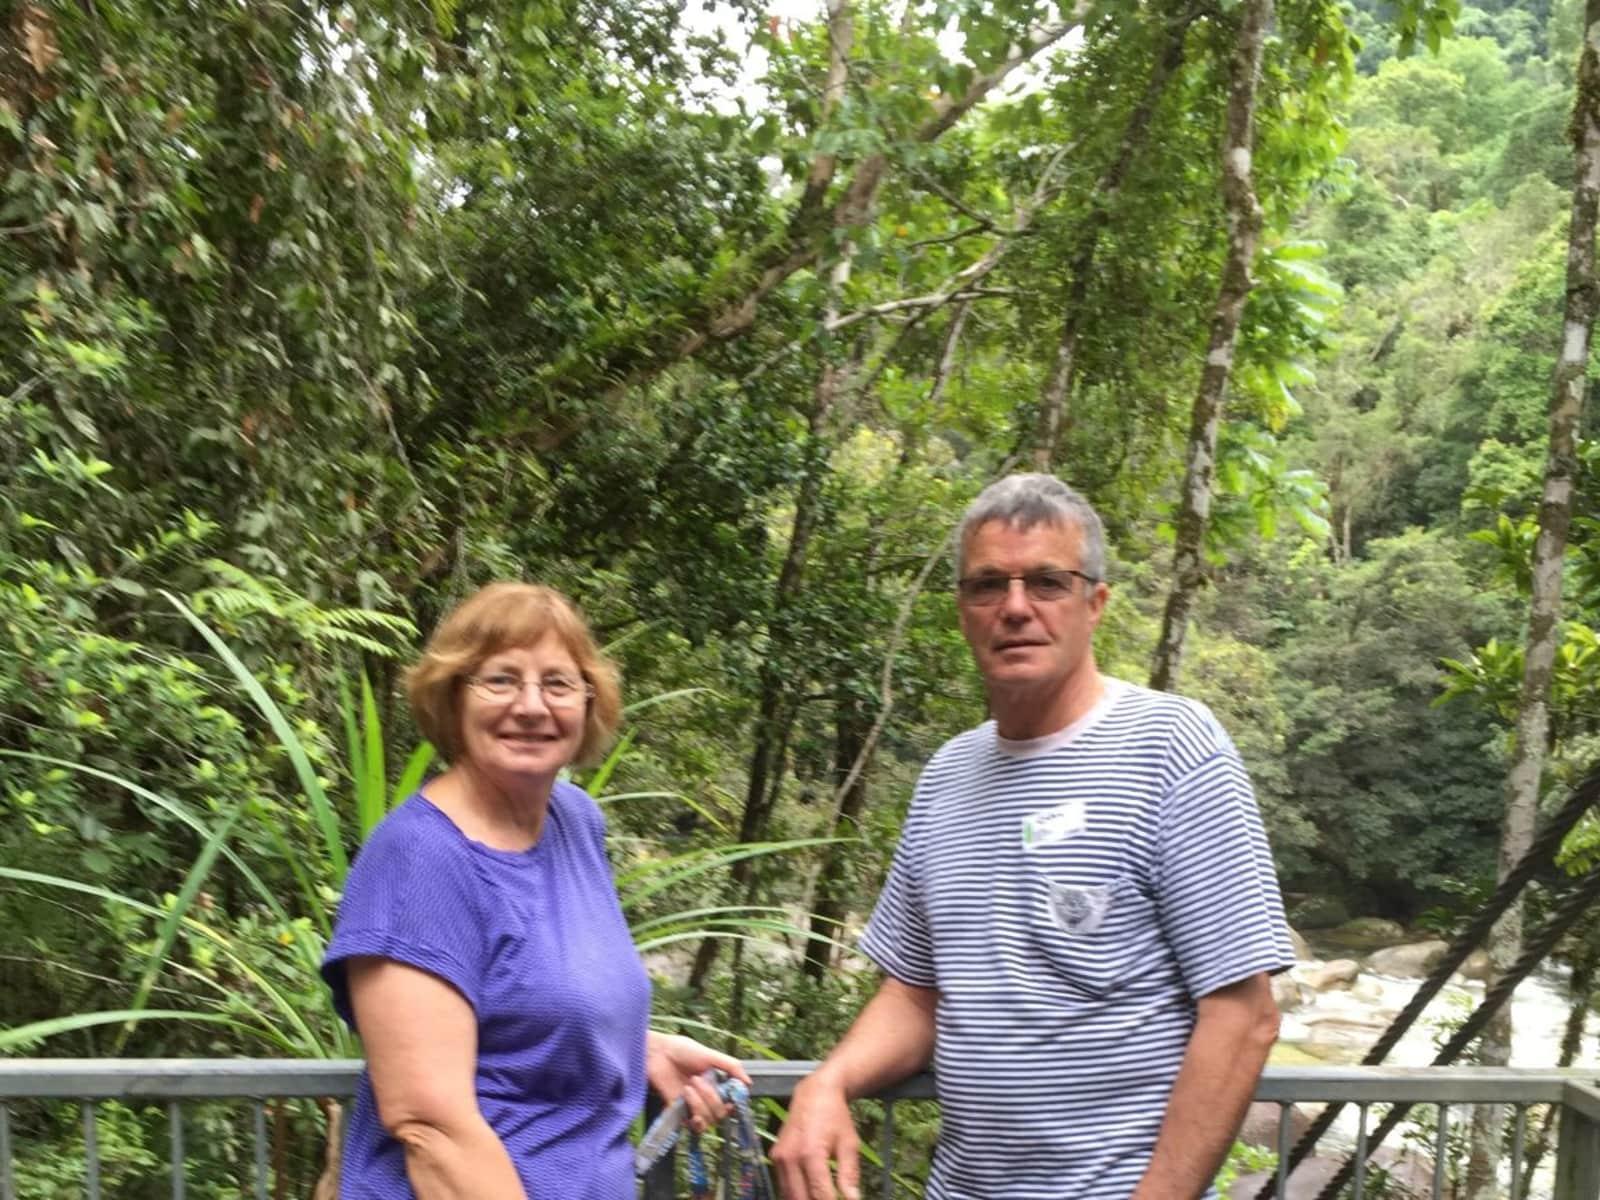 Kaye & Graham from Beulah, Victoria, Australia